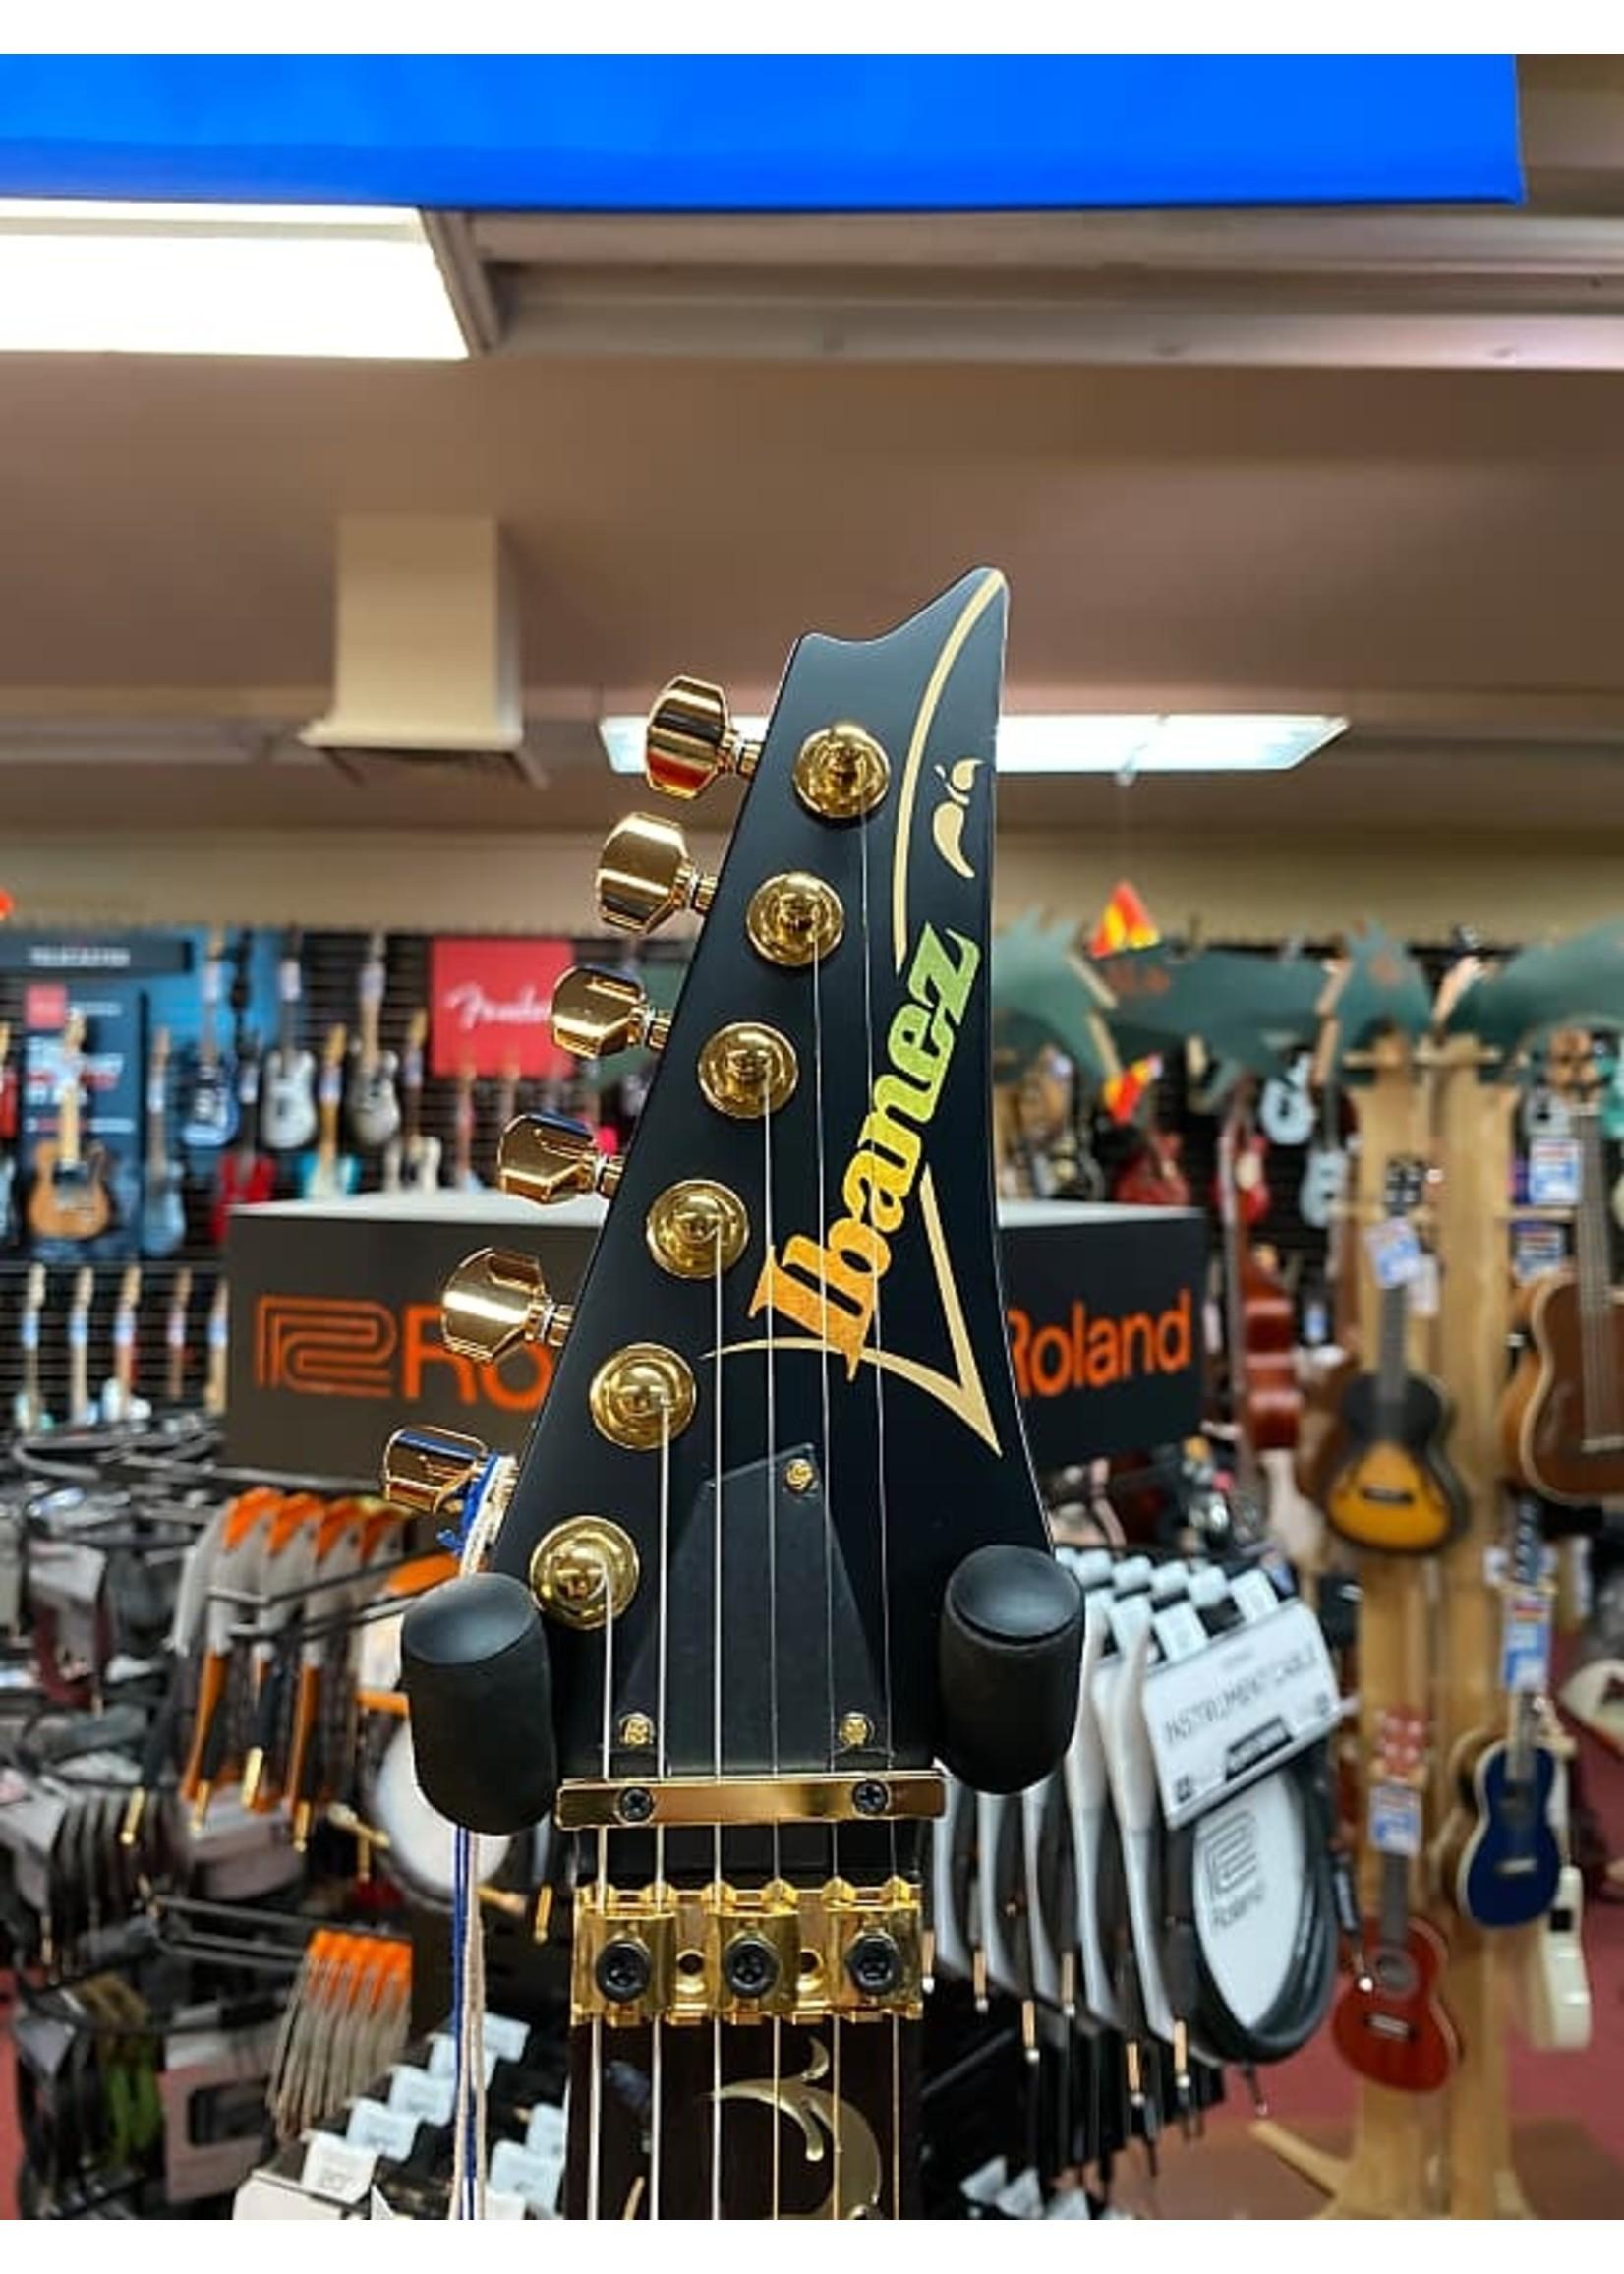 Ibanez Ibanez Steve Vai Signature PIA3761 Electric Guitar - Onyx Black